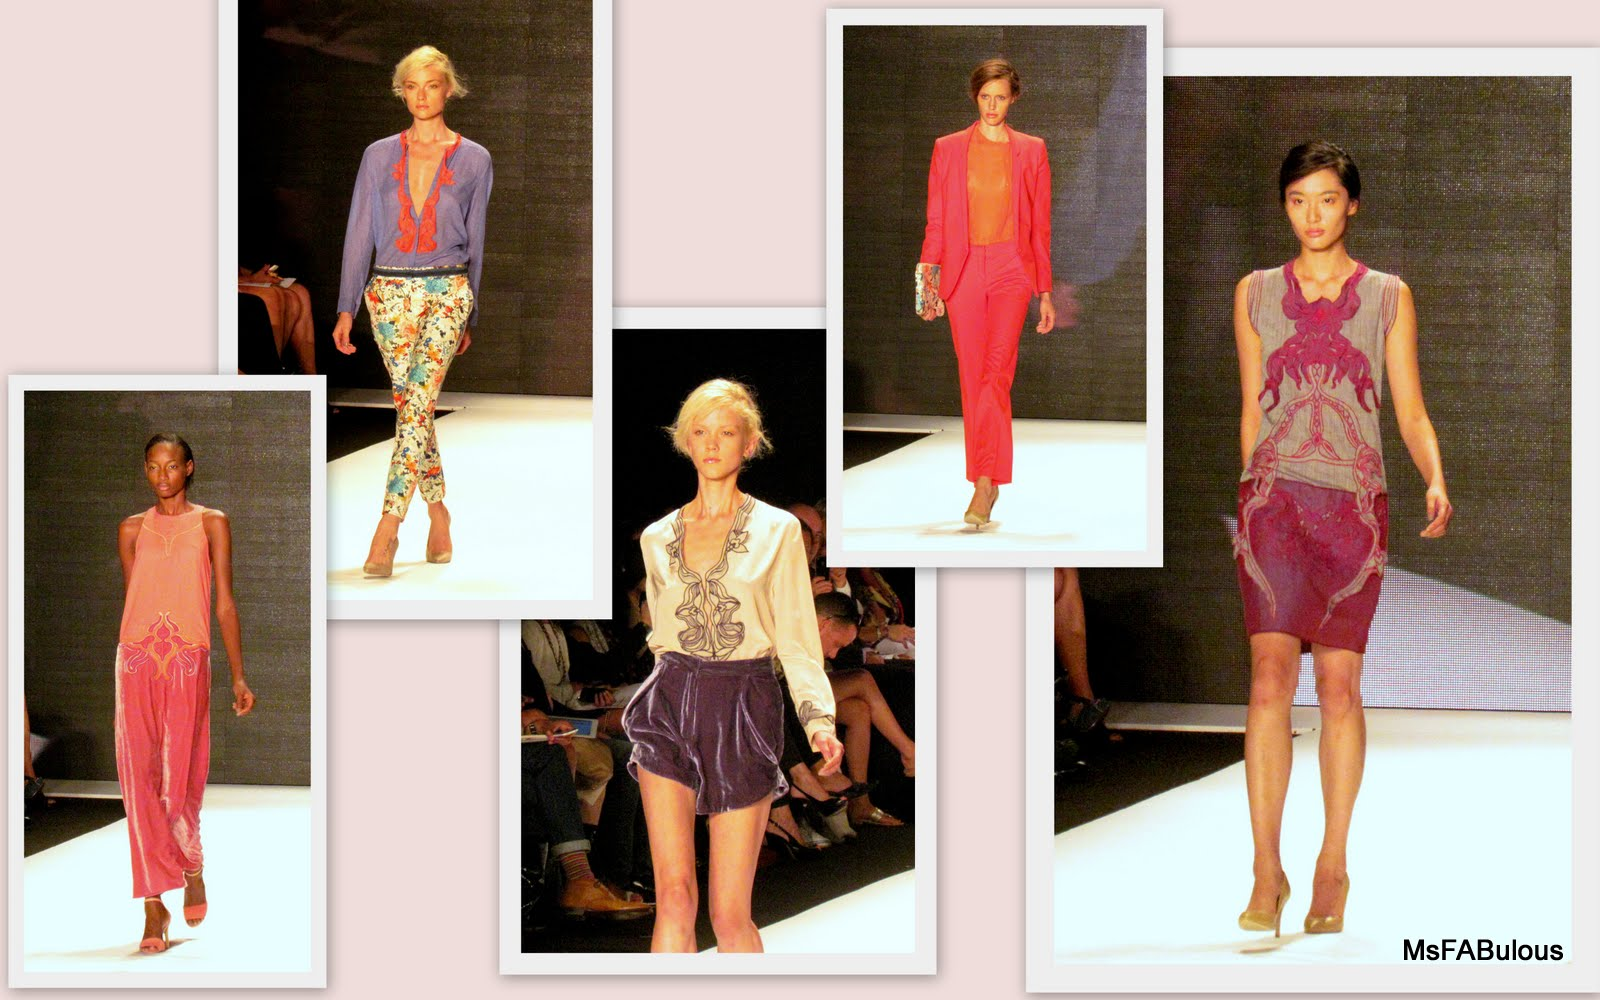 http://4.bp.blogspot.com/-dOLWdj8yZa8/Tw26gXpG-XI/AAAAAAAAIHI/-tADyV7GmAc/s1600/Vivienne+Tam+Spring+20121.jpg